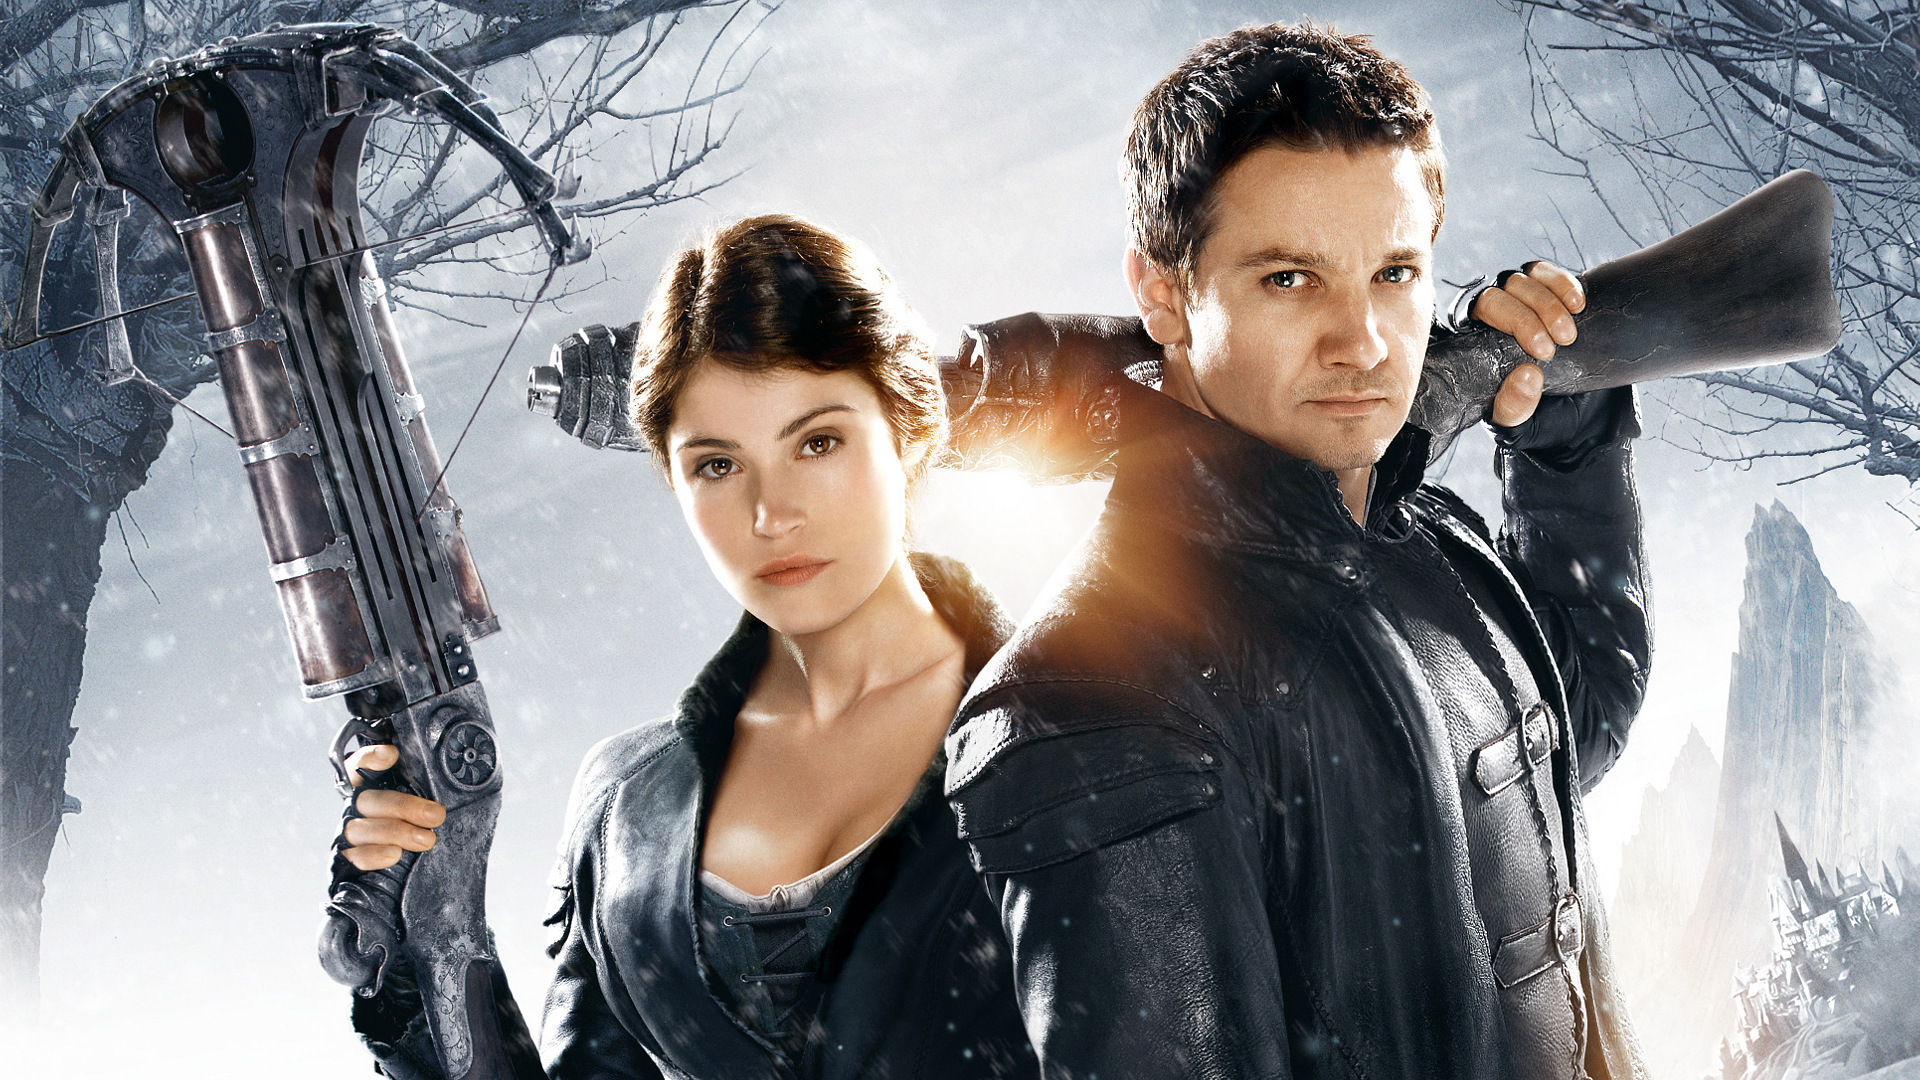 Hansel & gretel movie 2009